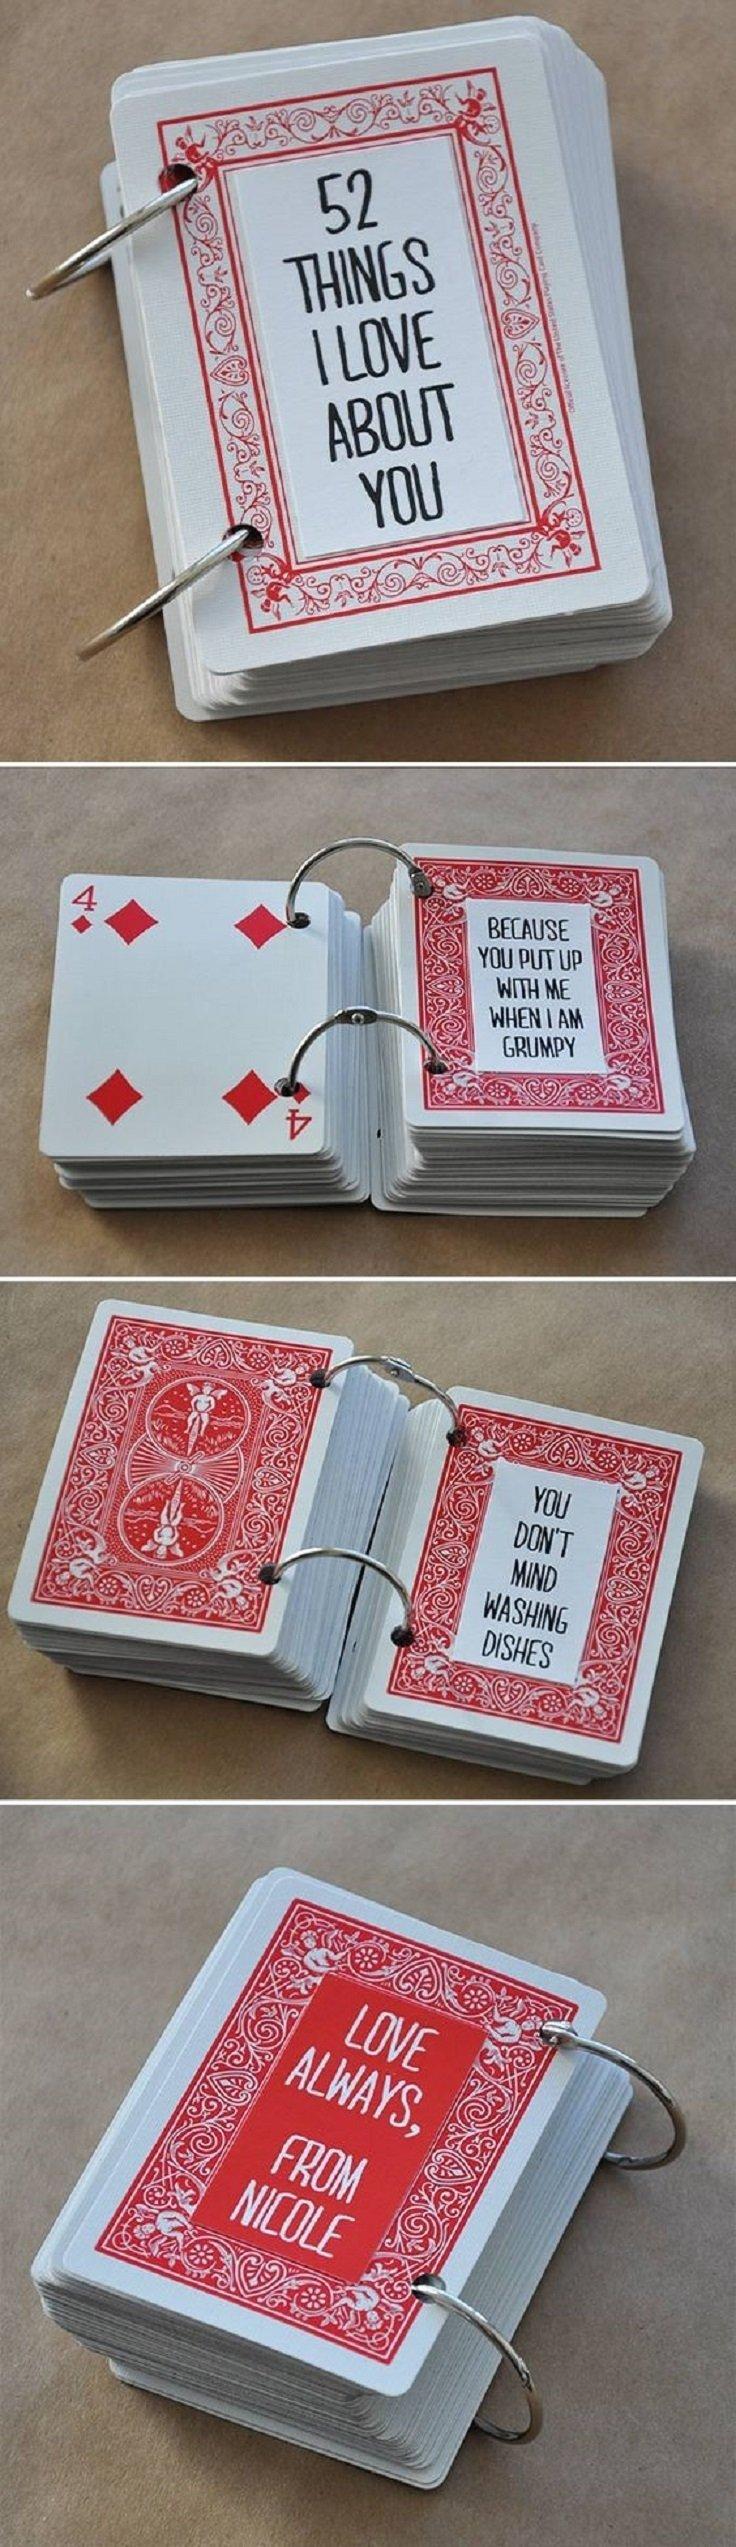 10 Stunning Cute Ideas To Do For Your Boyfriend cute things to get your boyfriend for valentines day startupcorner co 2020